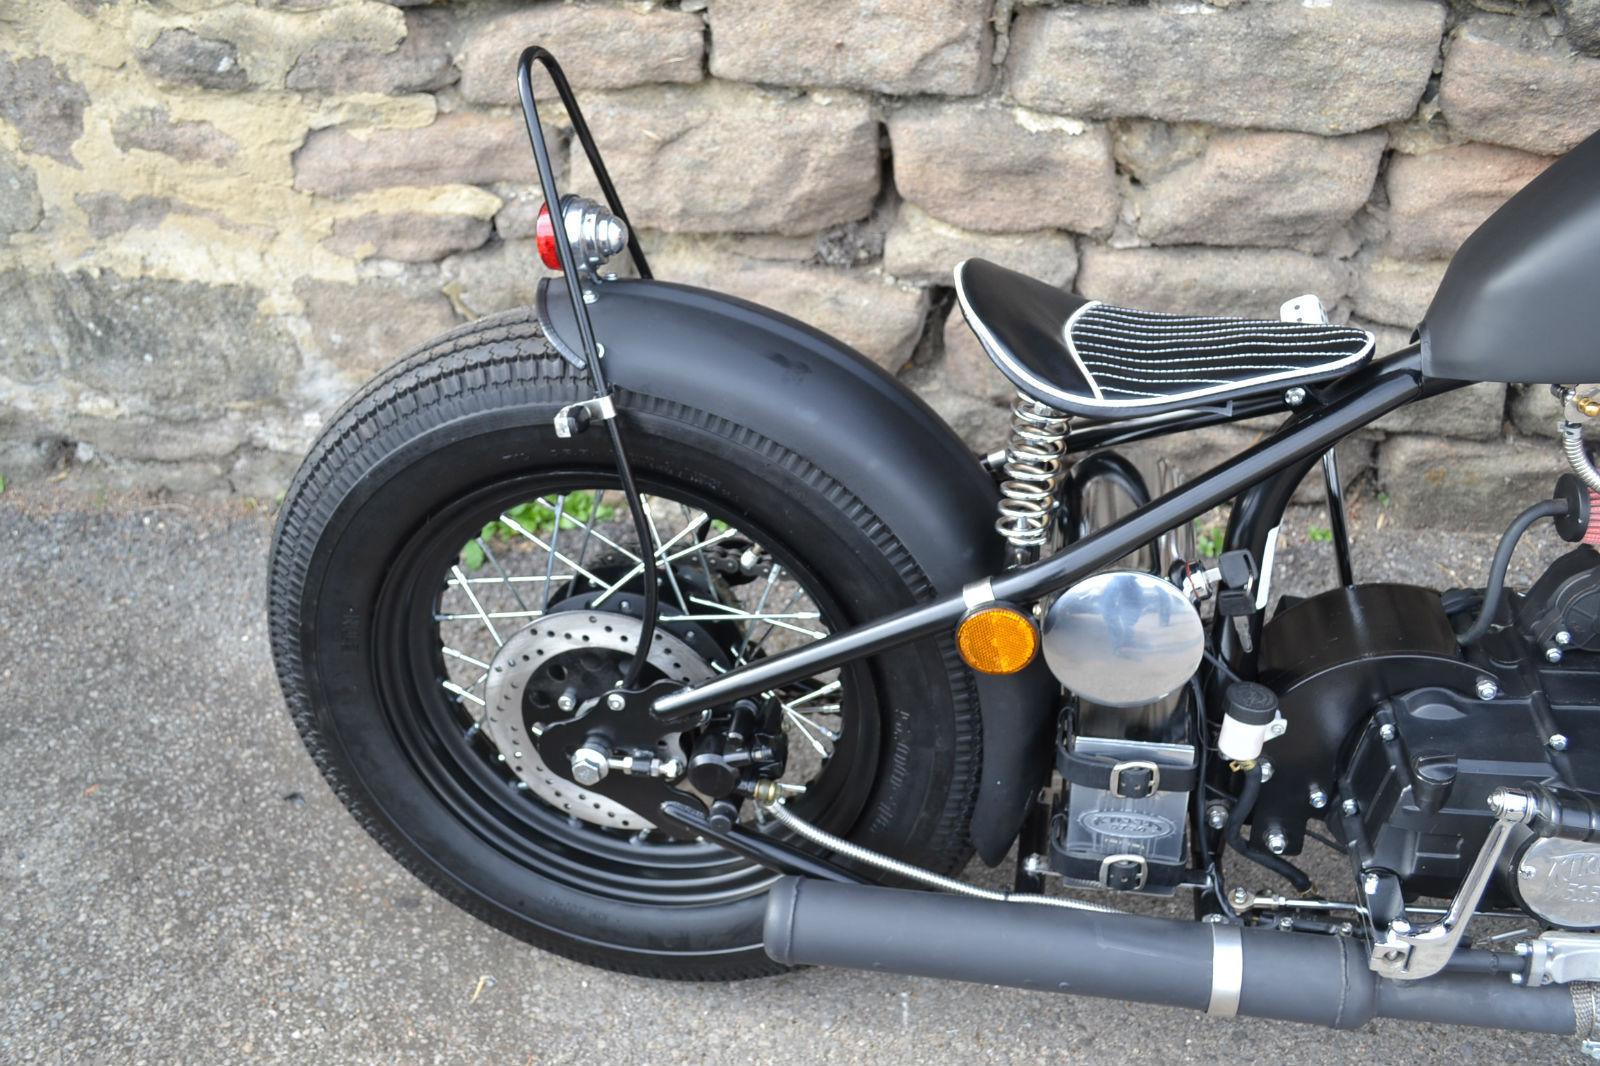 Hardknock Kicker Kikker 125cc Chopper Bobber 125cc